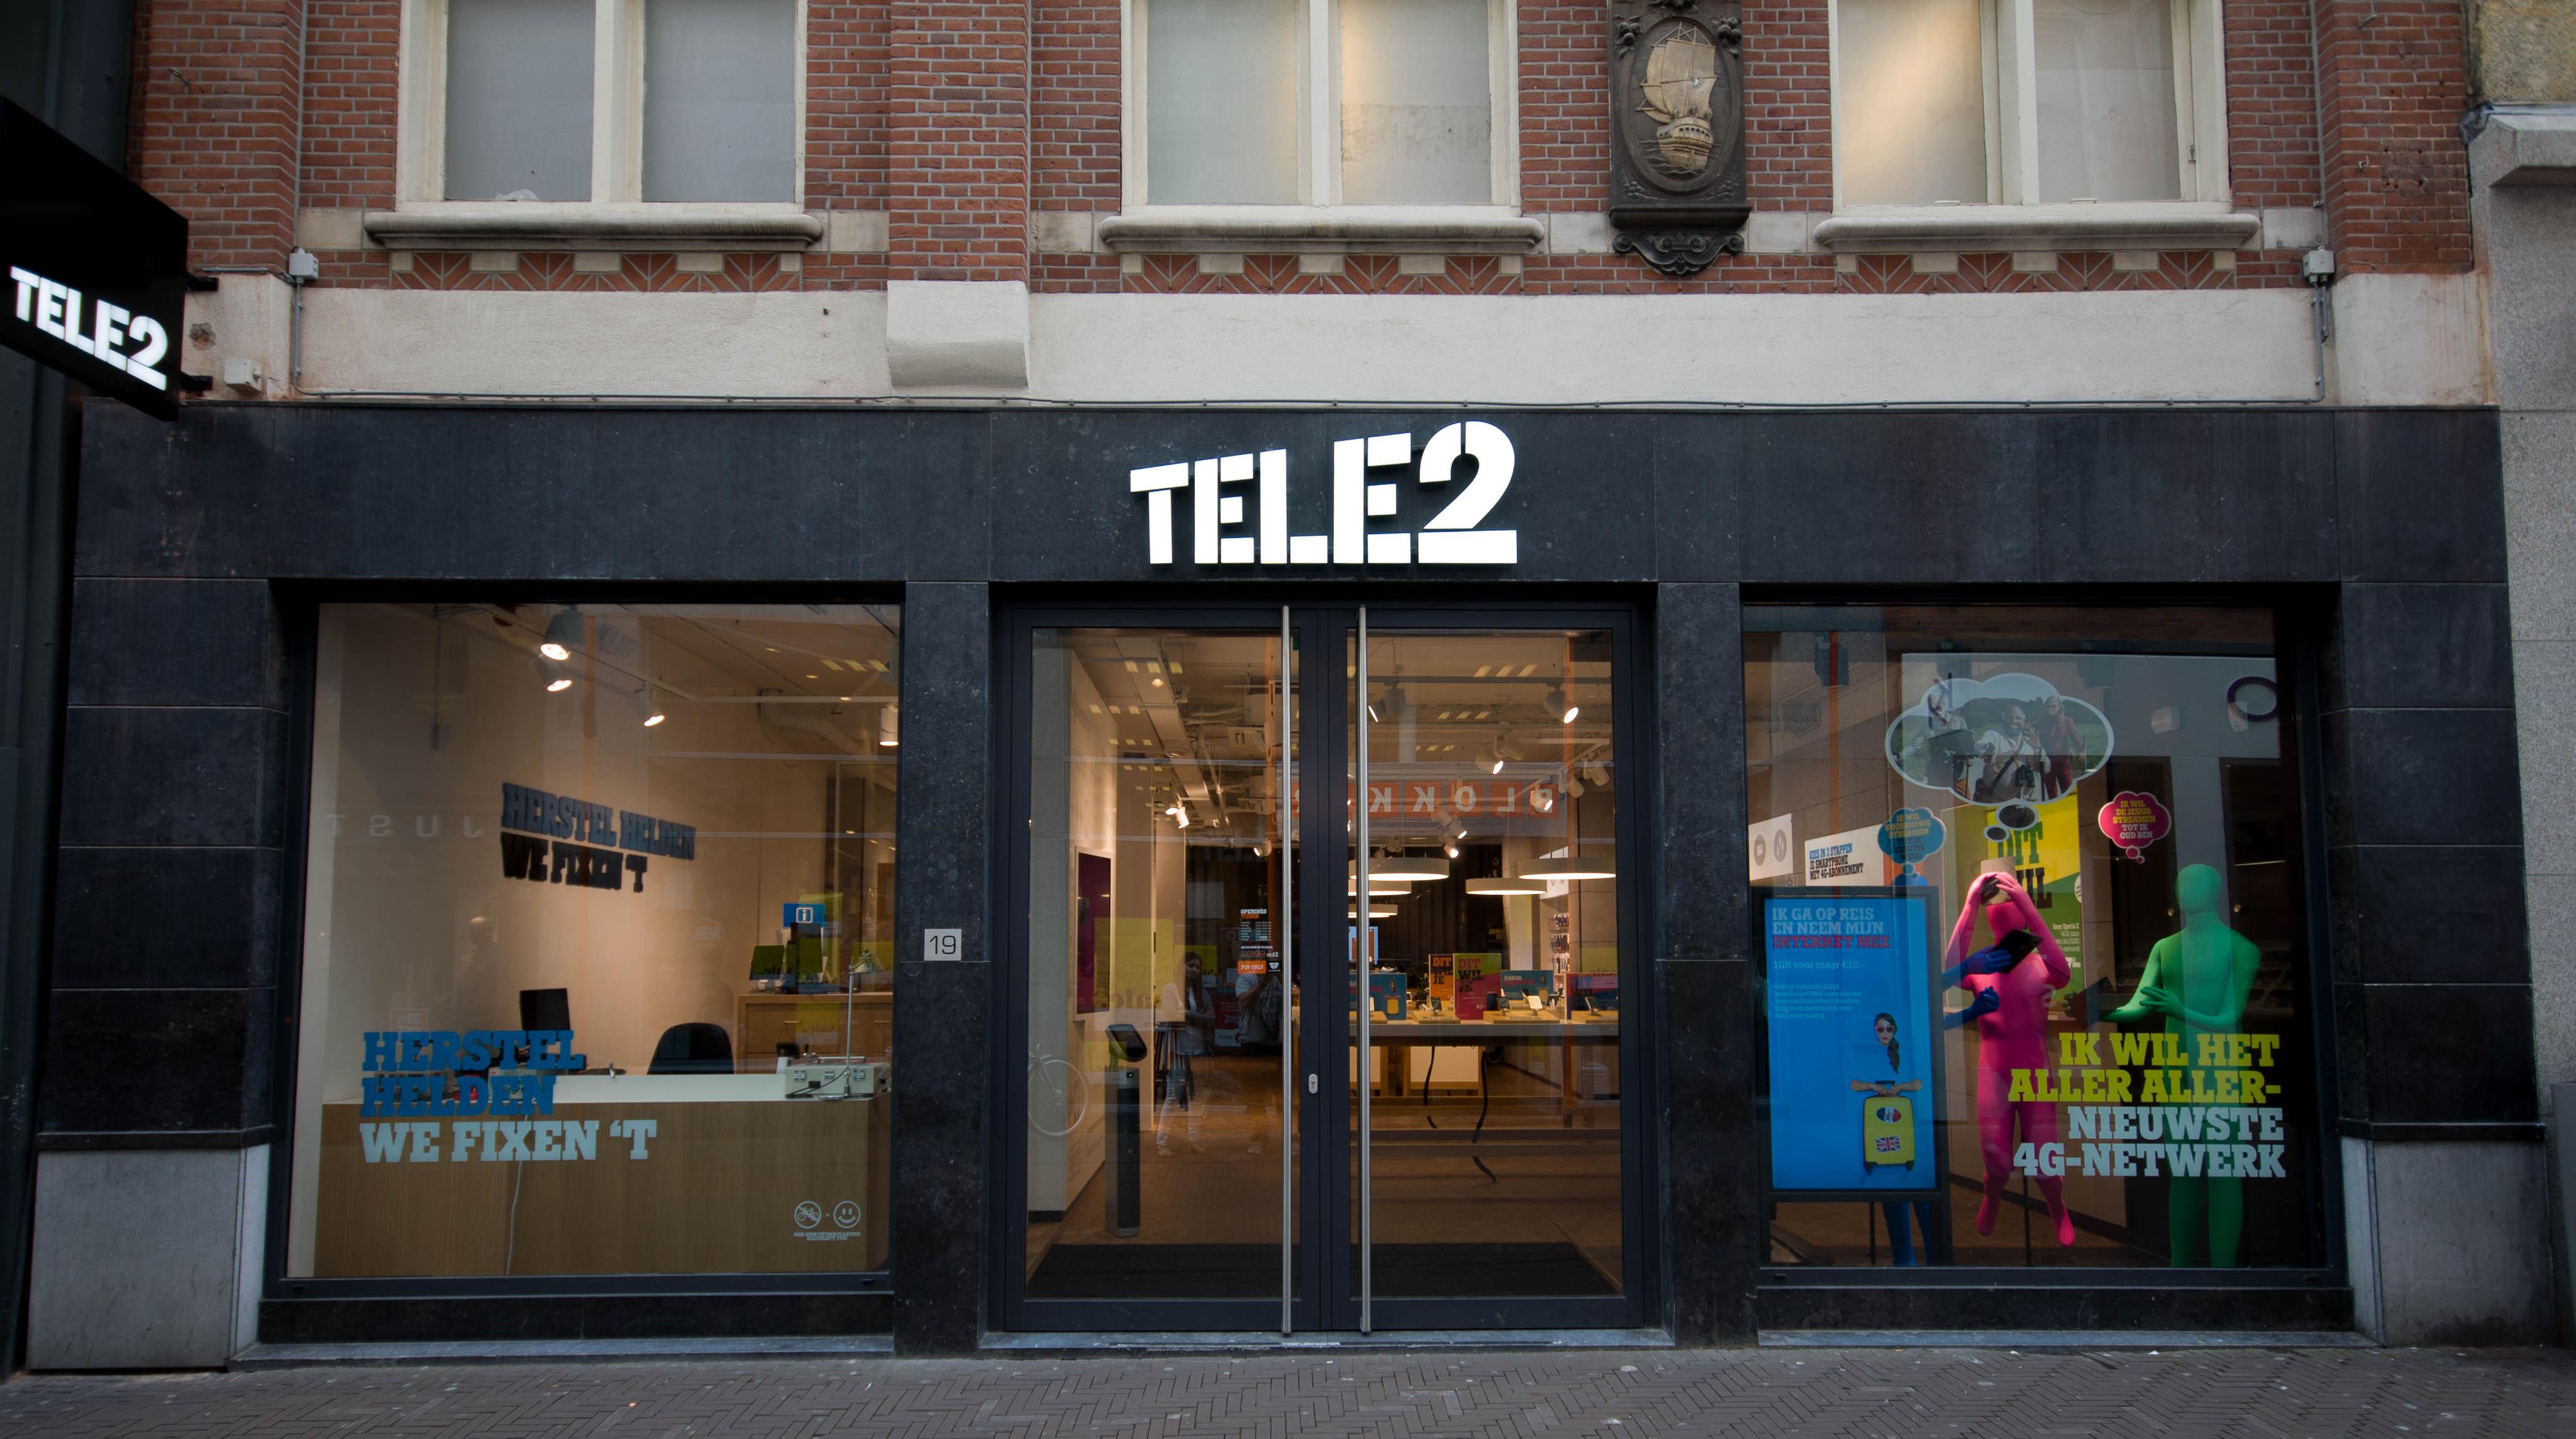 Tele2 - Den Haag